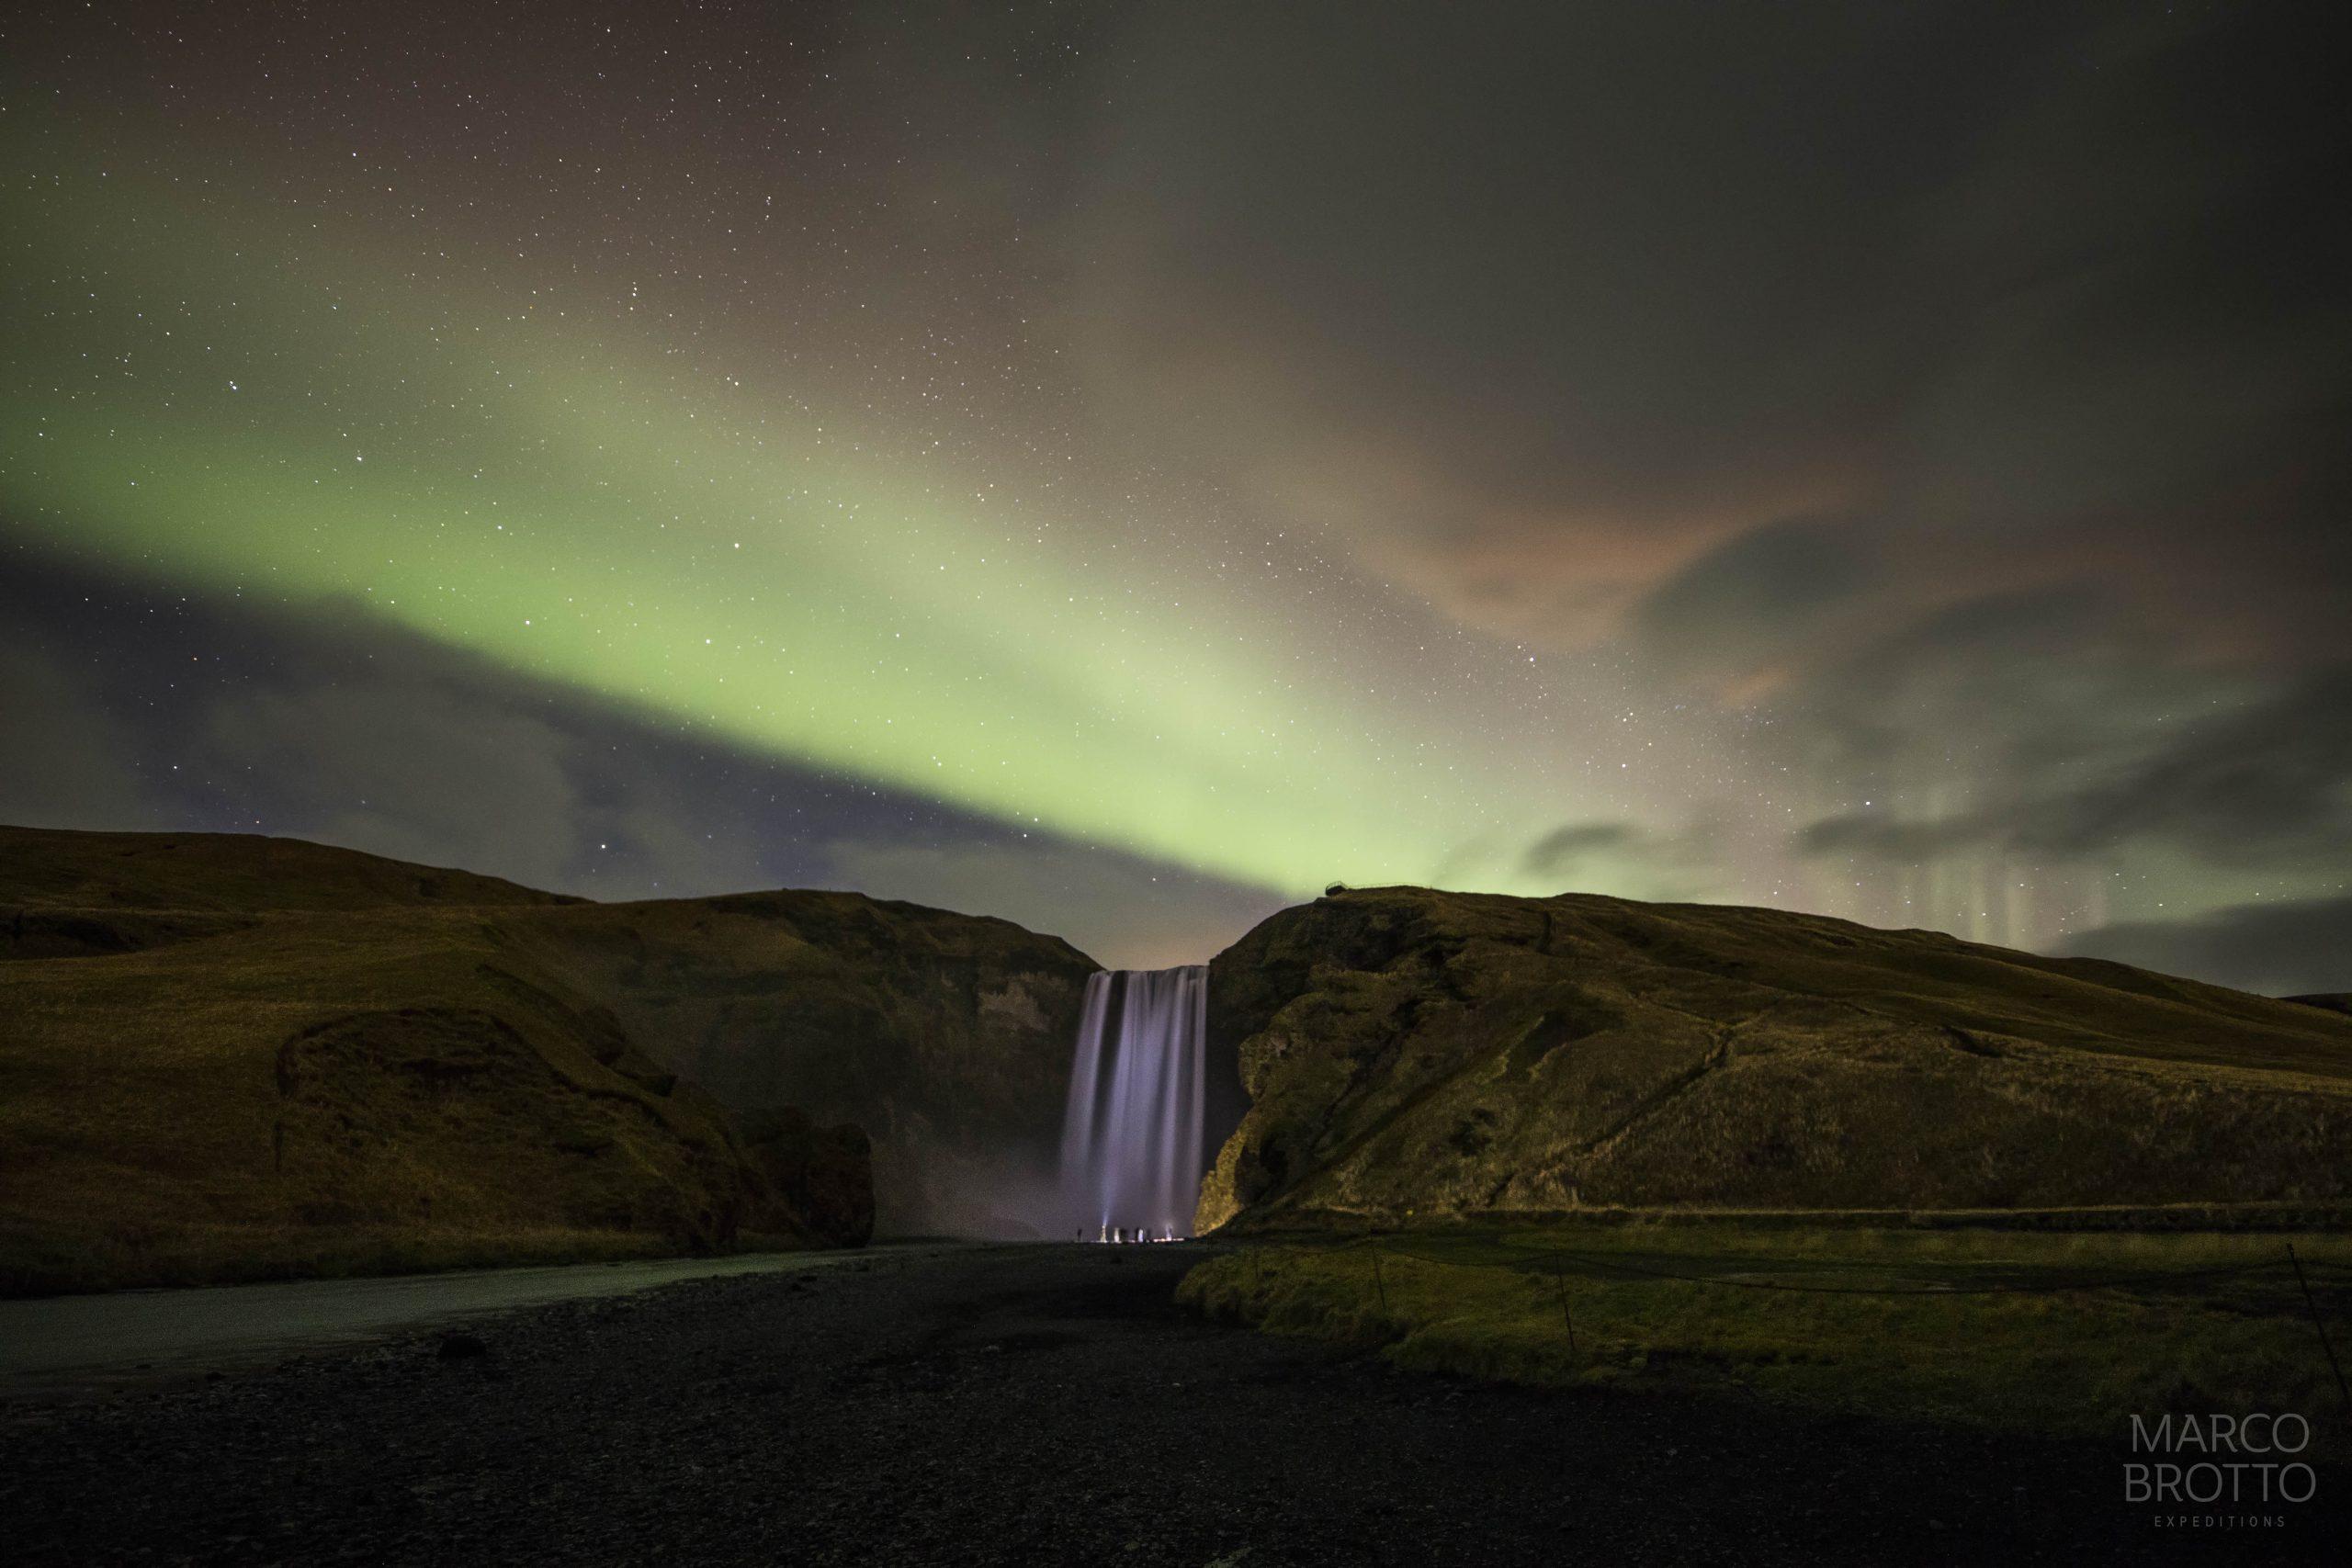 ICELAND-17-NOV-Jorge-Canon-EOS-5D-Mark-IV-2017-11-08-173836-Photoshop-16878